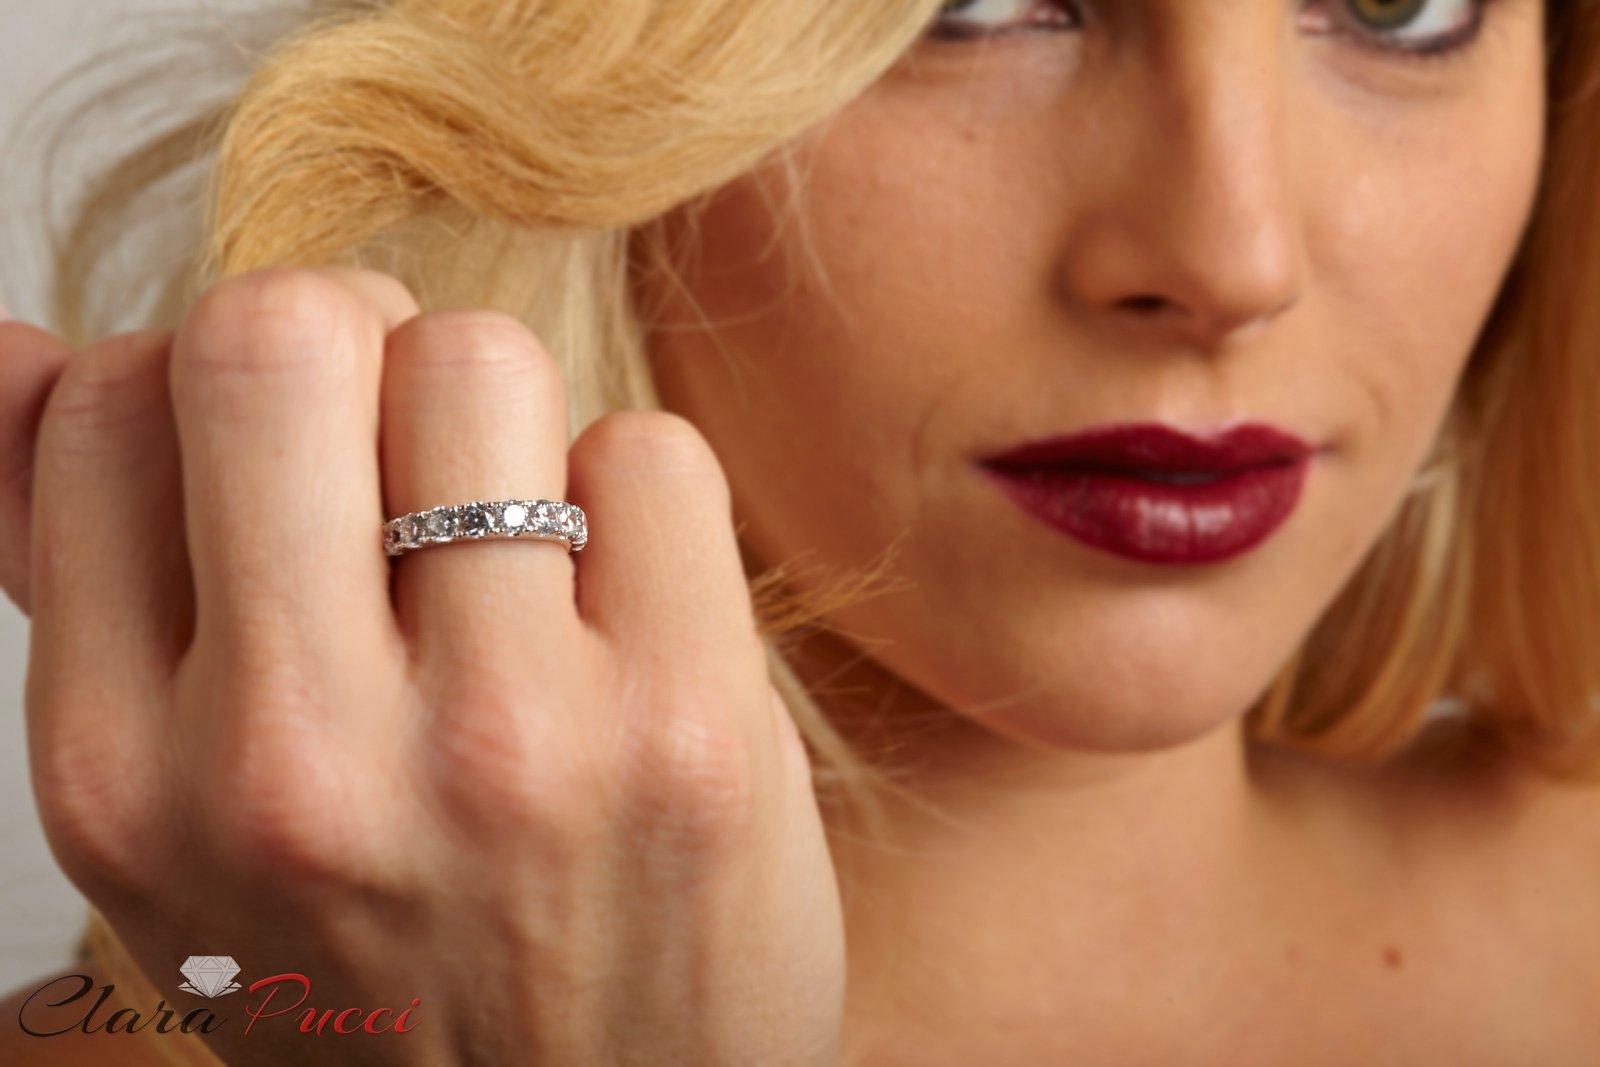 Clara-Pucci-14-CT-Round-Cut-Pave-Set-Bridal-Wedding-Engagement-Band-Ring-14kt-White-Gold